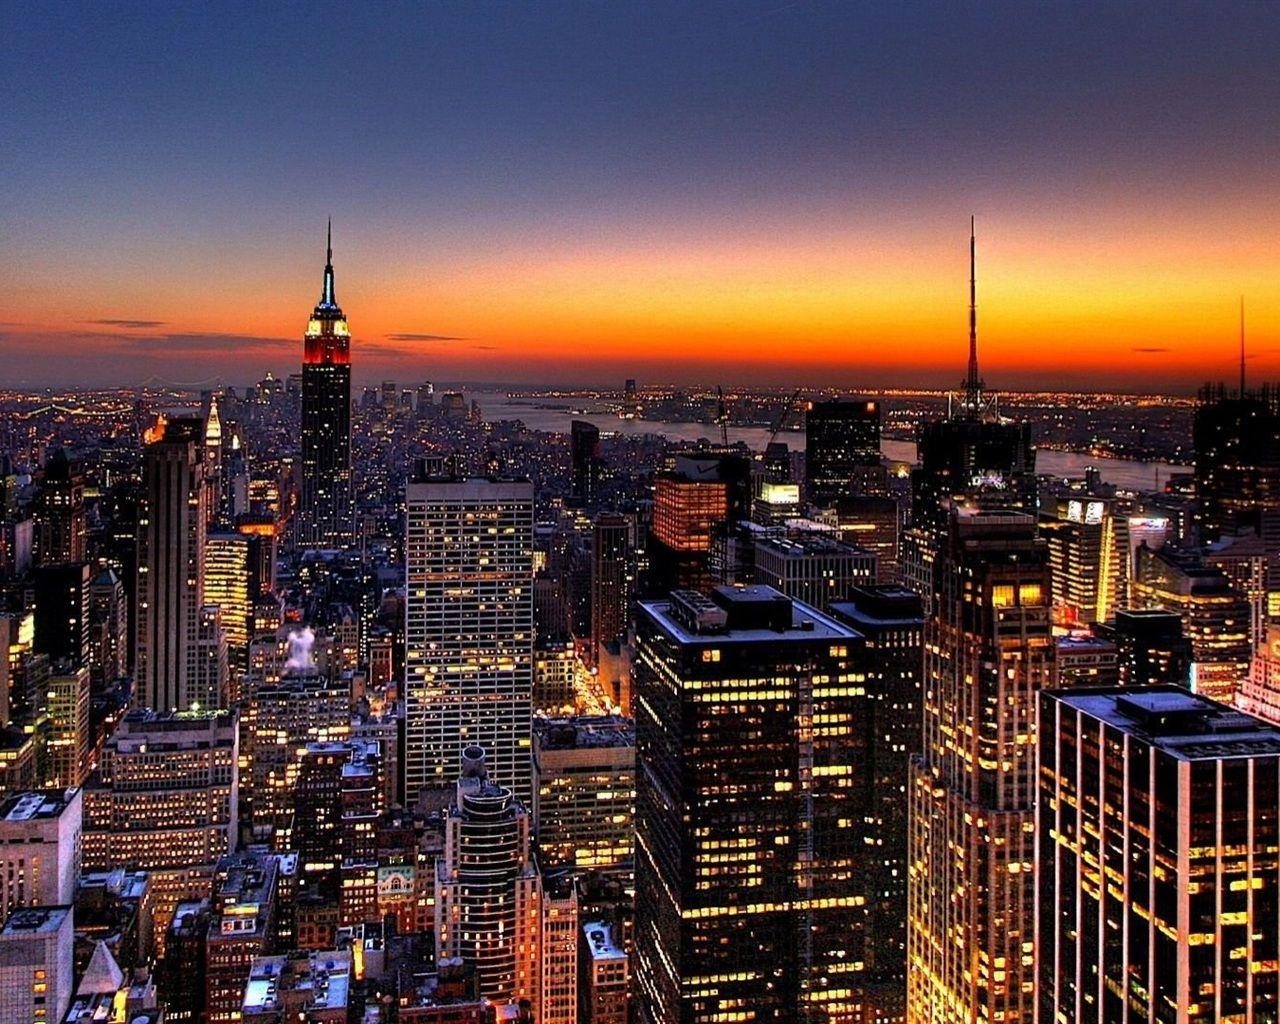 Nyc Skyline Photos Skyline Von New York Hintergrundbilder 1280x1024 Hintergrundbilder New York Wallpaper New York Skyline Skyline